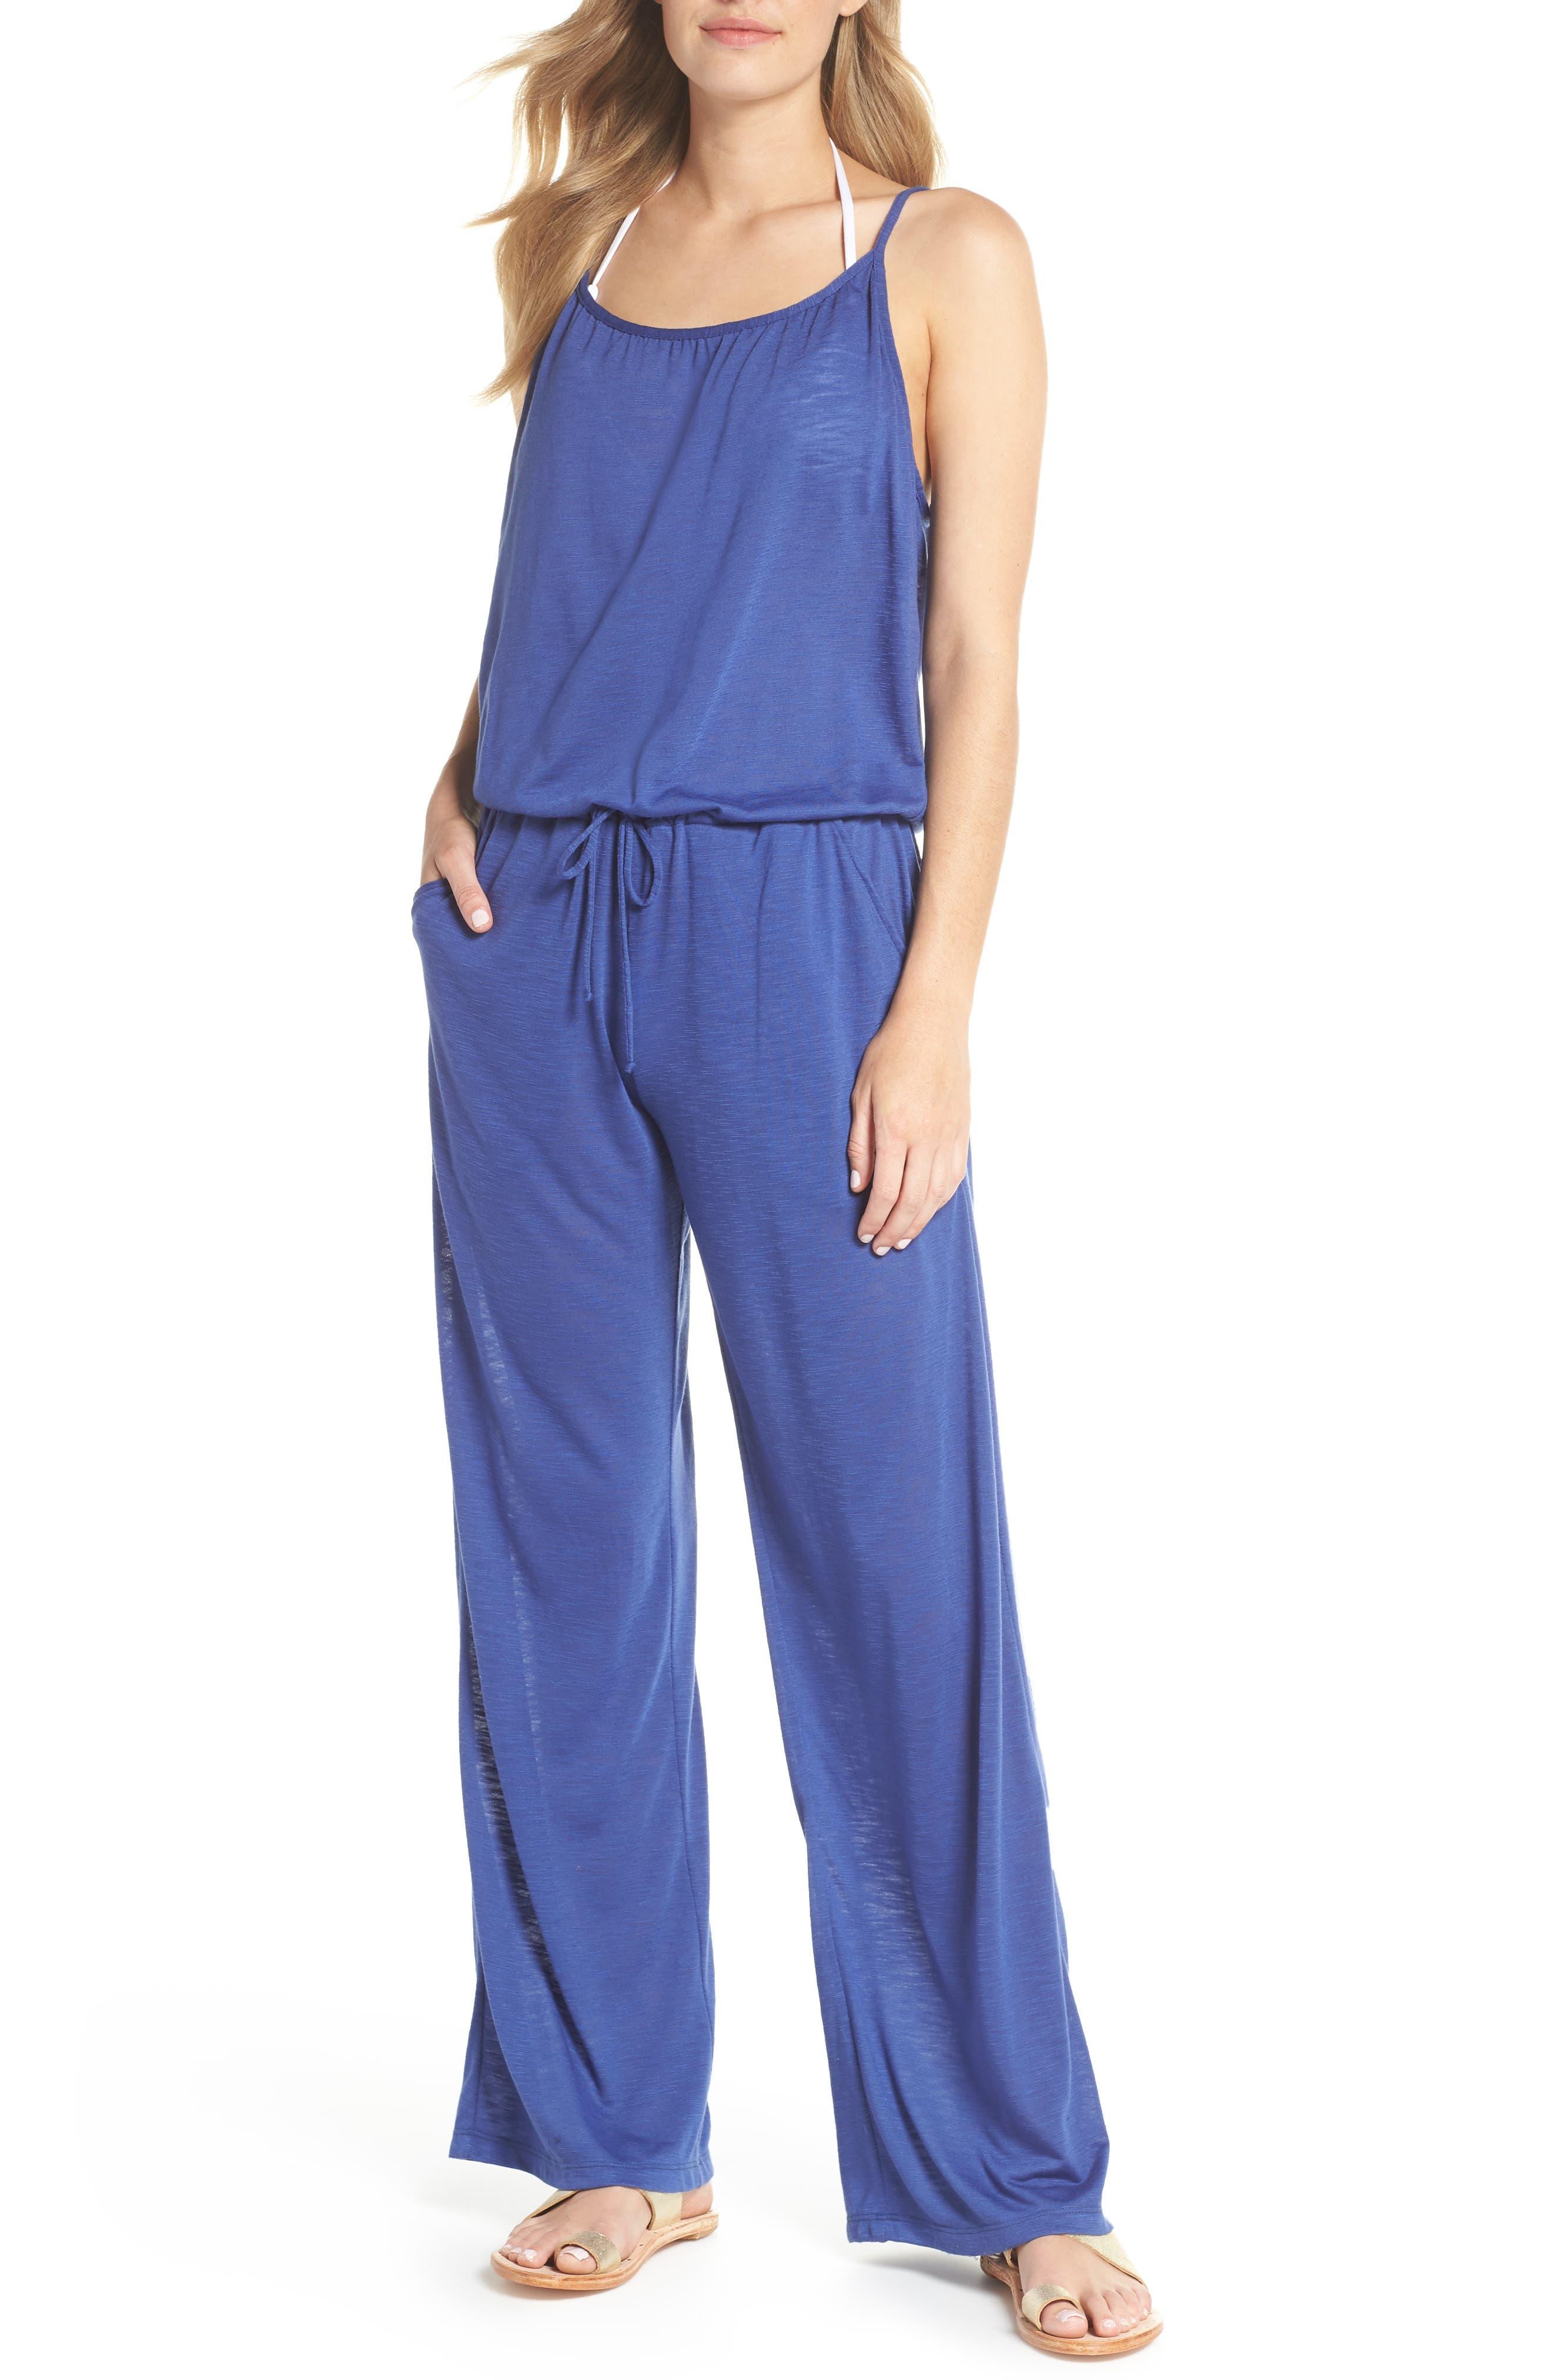 5ab7e707f5f8a Becca Breezy Basics Jumpsuit In Blue Topaz